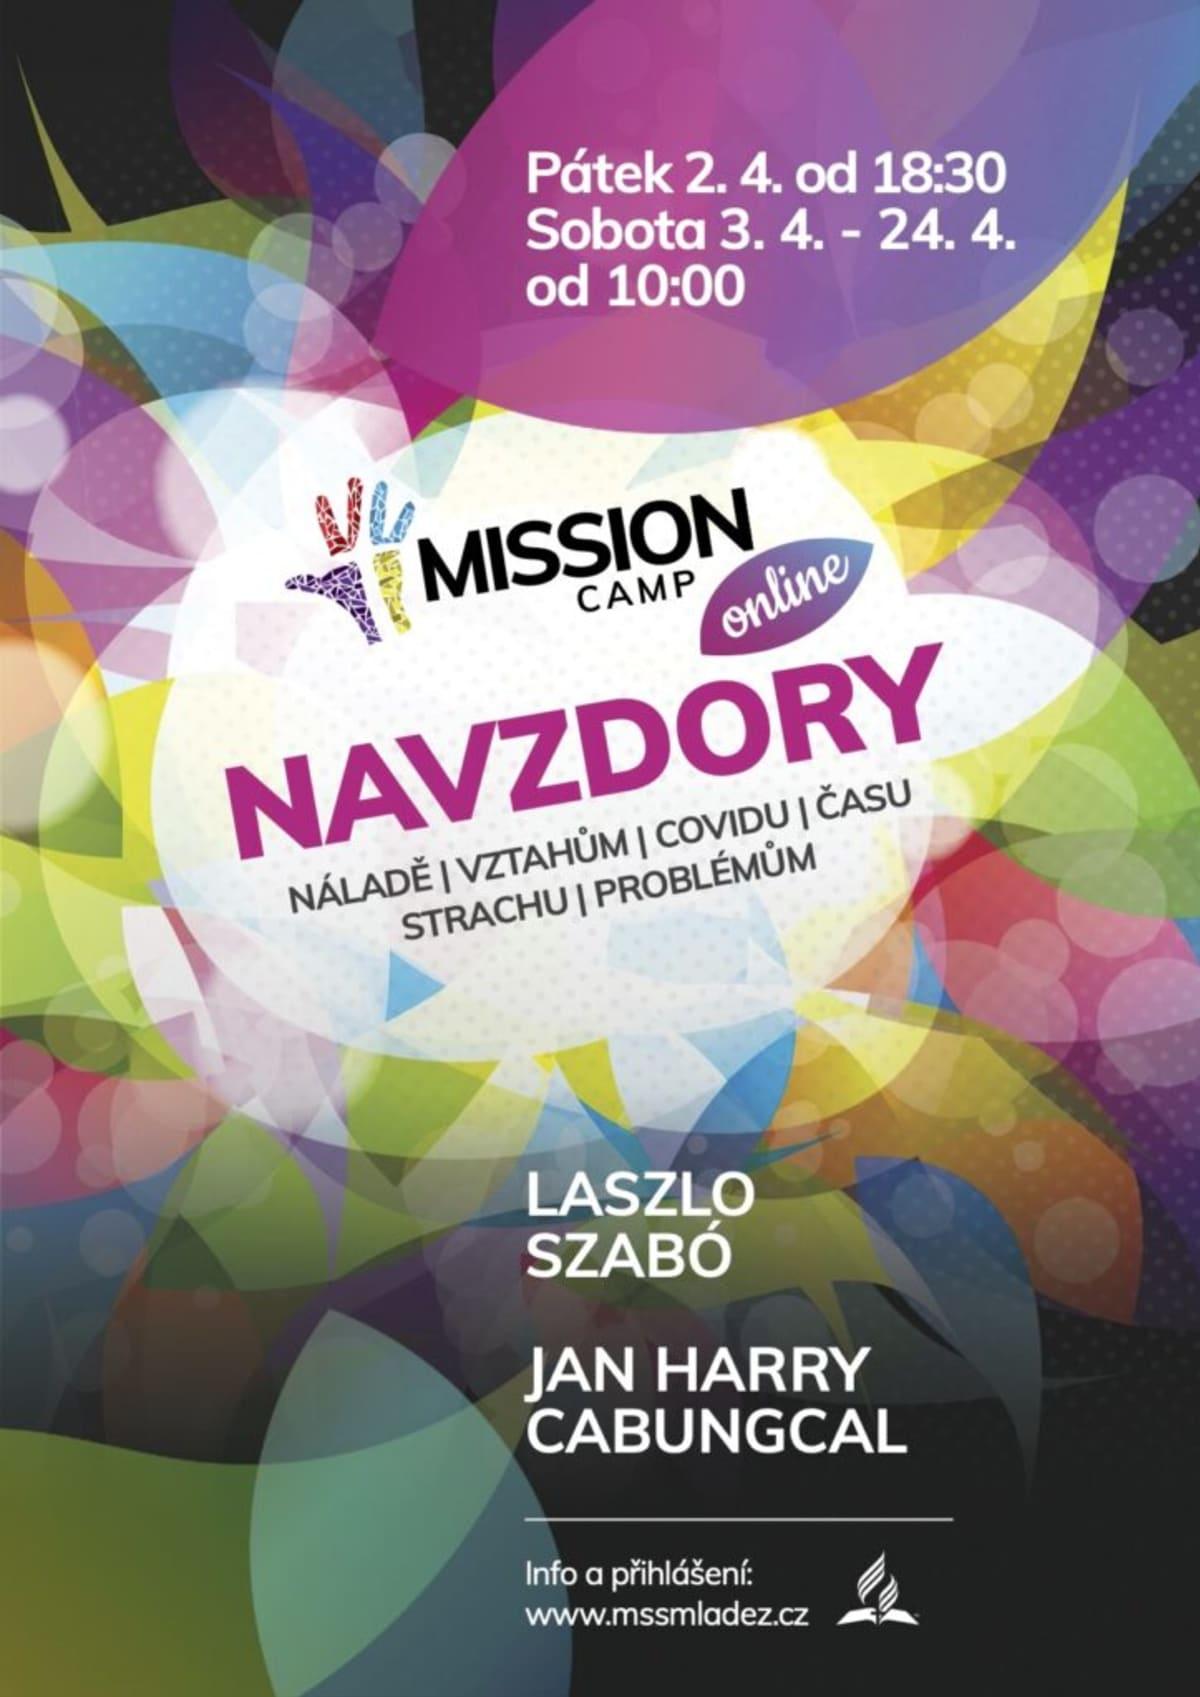 Navzdory-misson-camp-1-724x1024